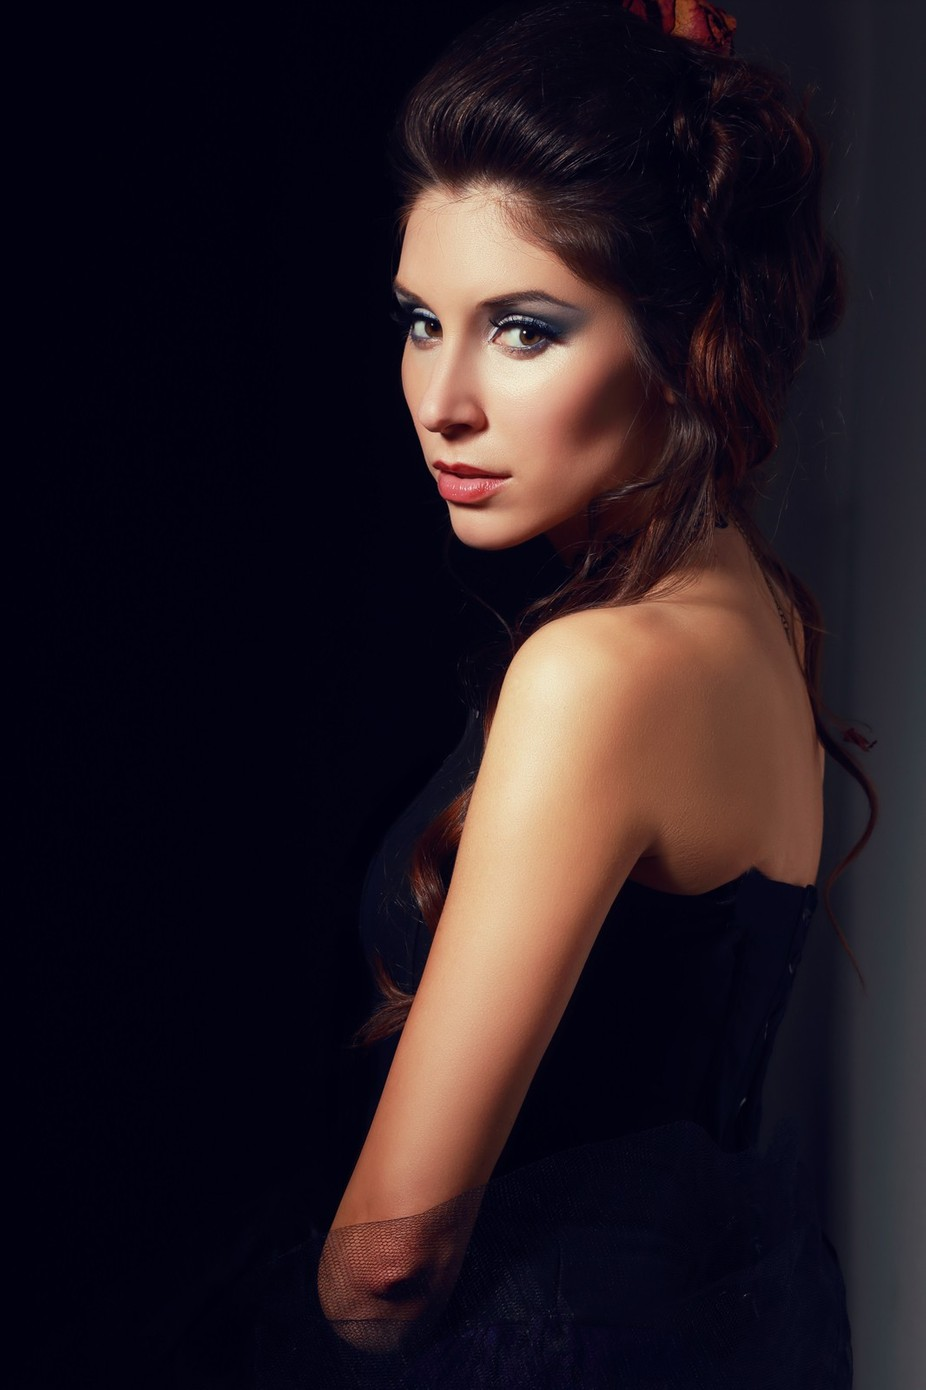 vampire victorian style woman by olenazaskochenko - Fill Flash Photo Contest